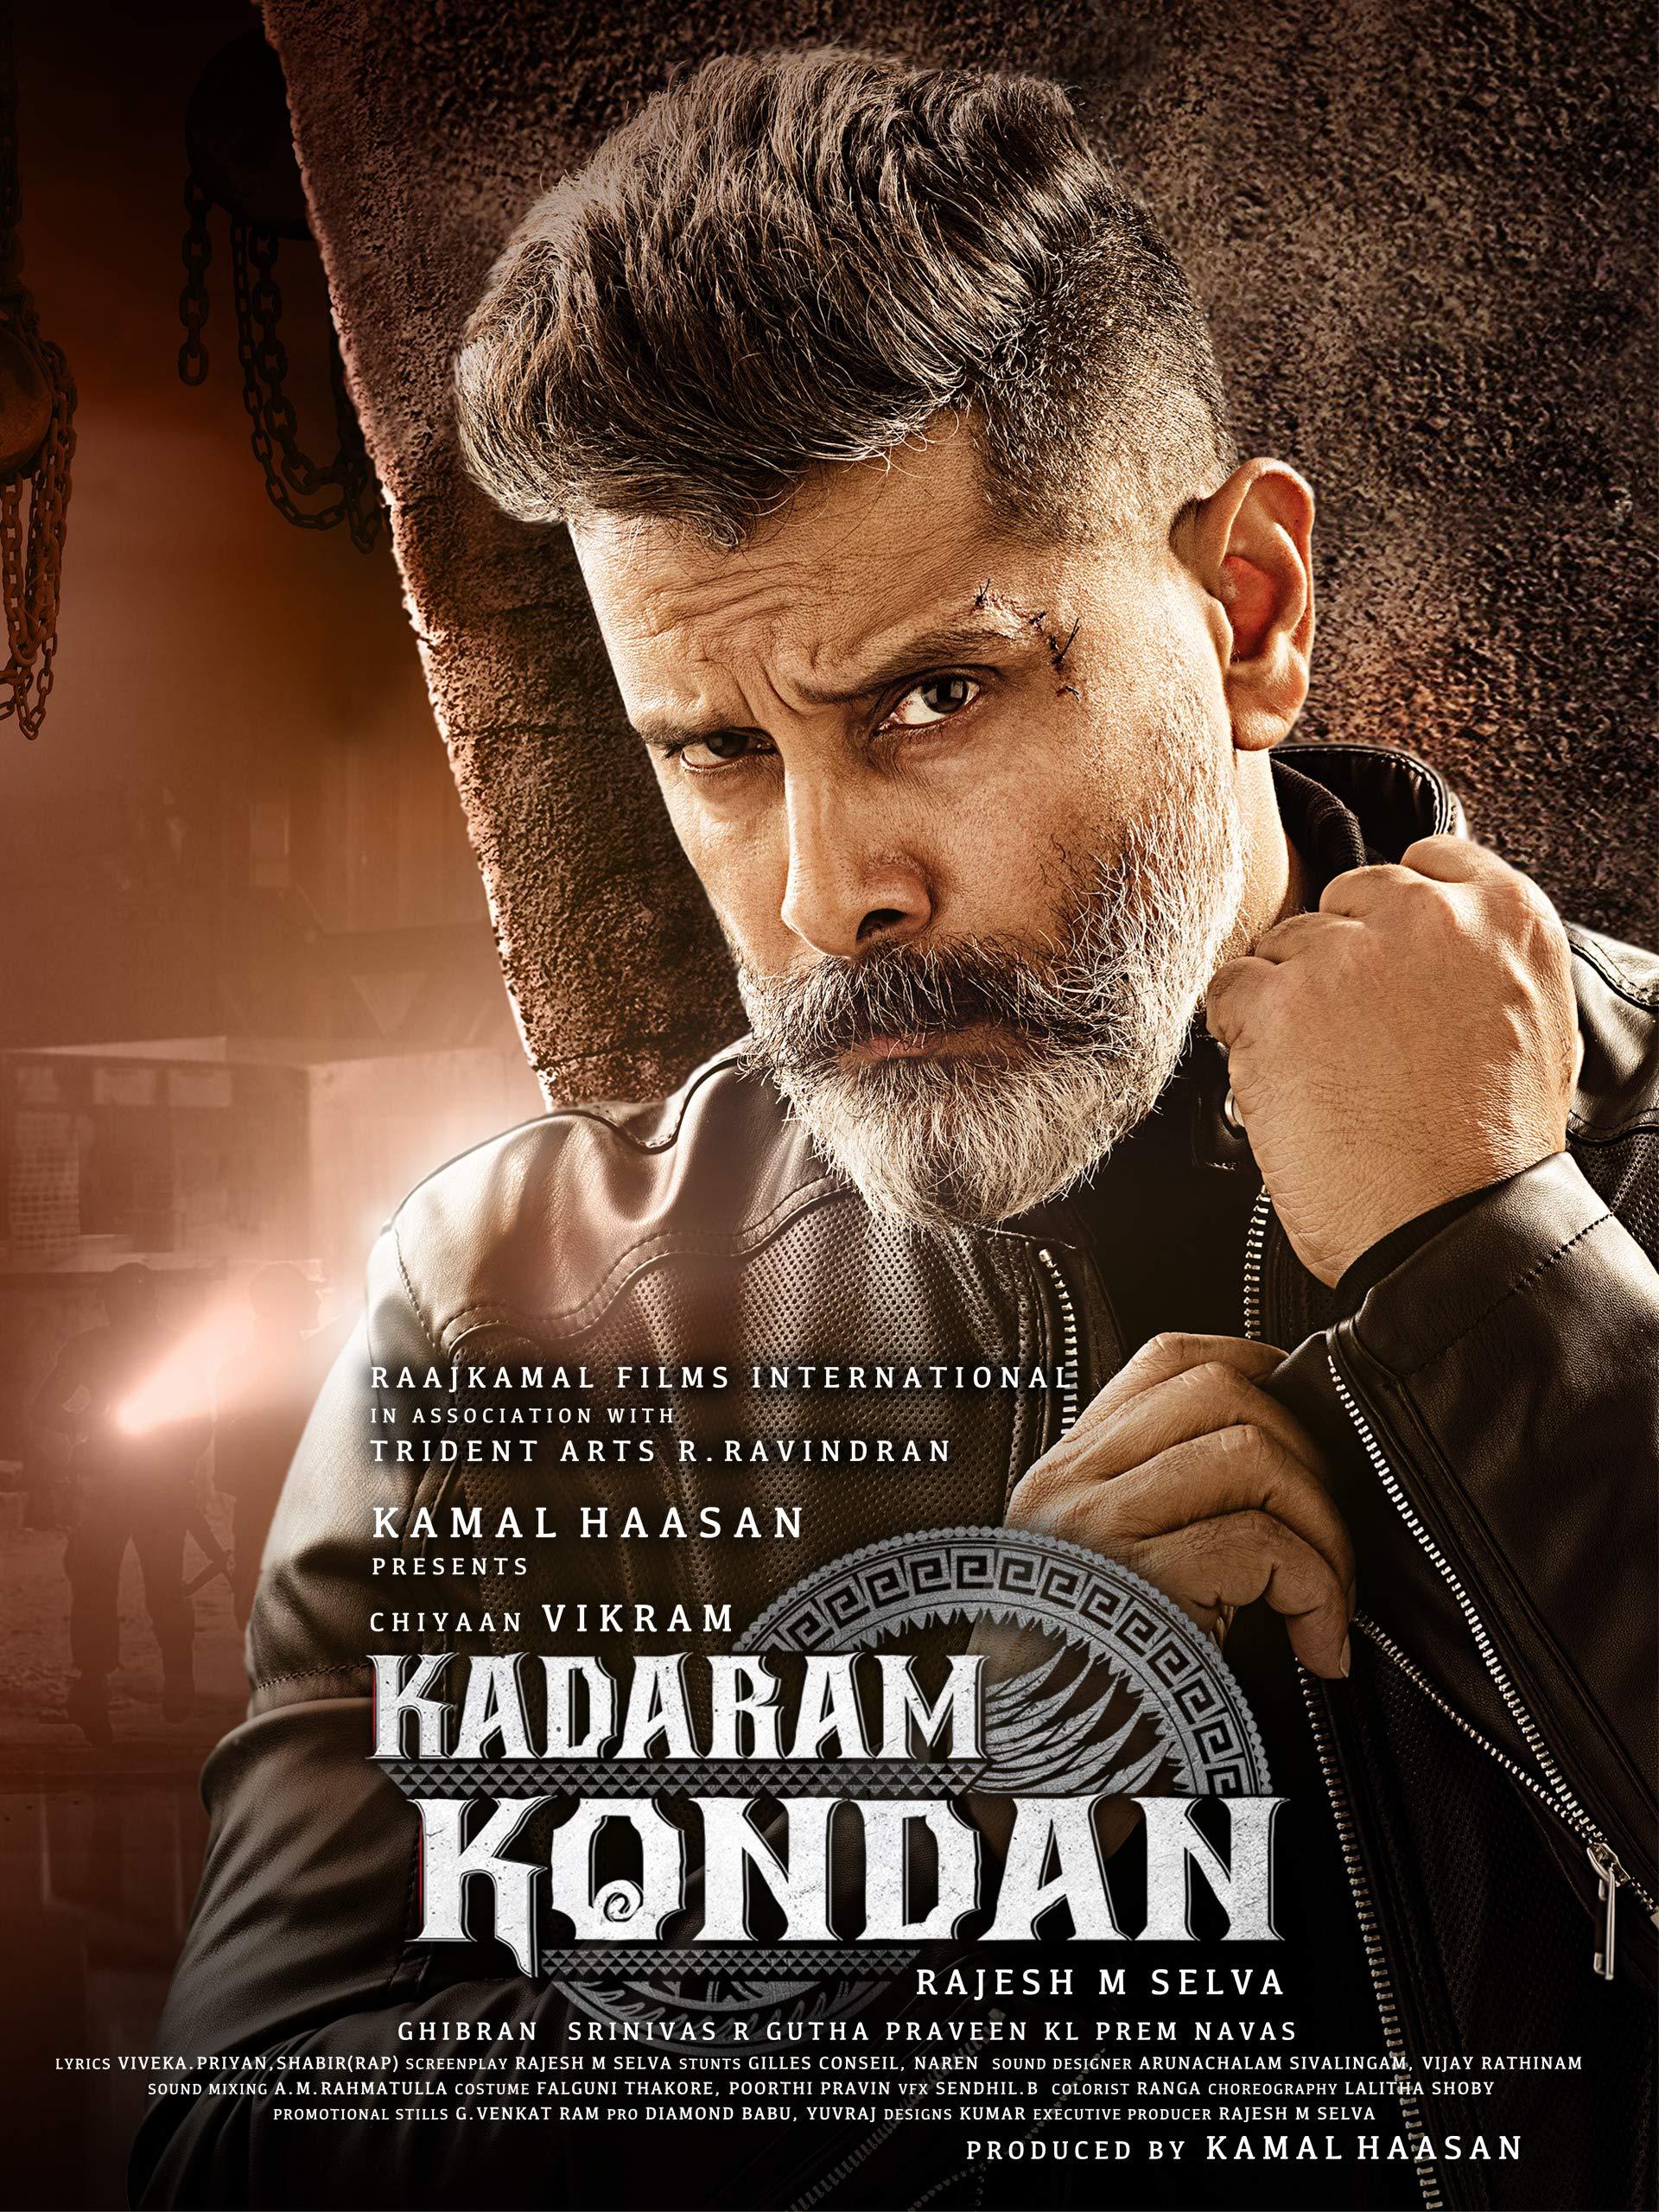 Amazon co uk: Watch Kadaram Kondan | Prime Video